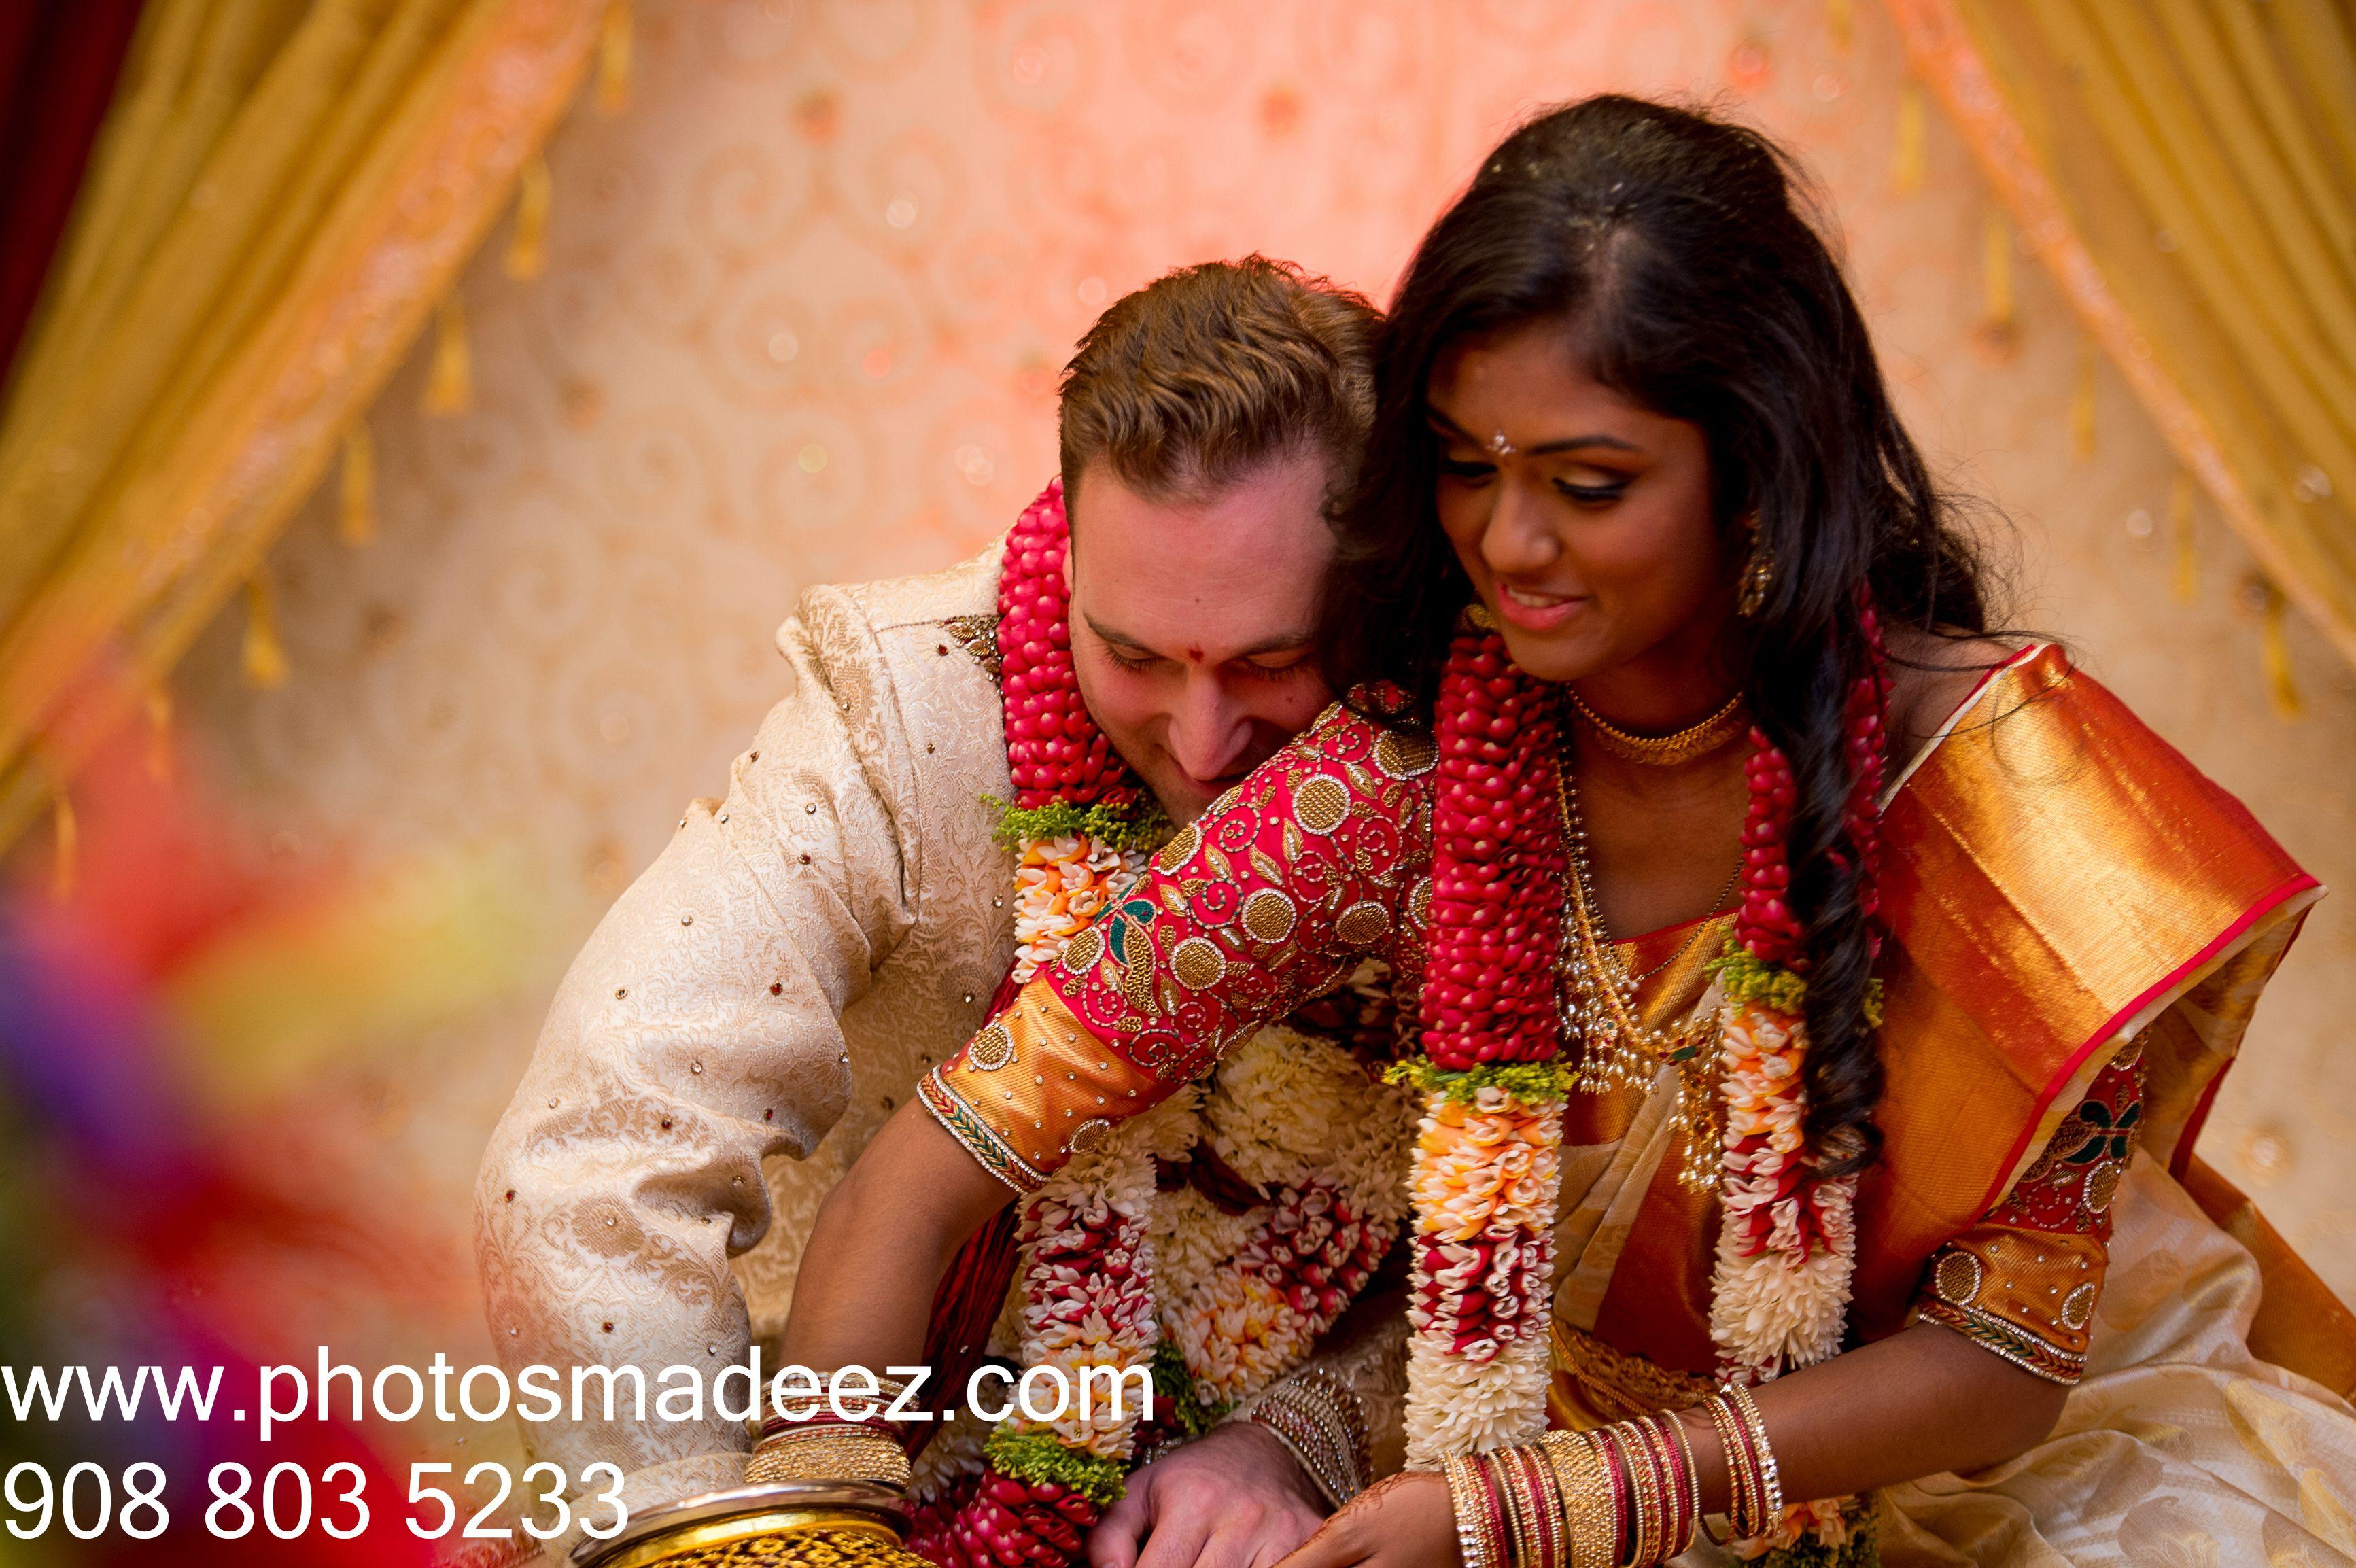 f5737f5e8e Best Wedding Photographer PhotosMadeEz, Award winning photographer Mou  Mukherjee. # GDfallsinlove - South Indian Bride, American Groom